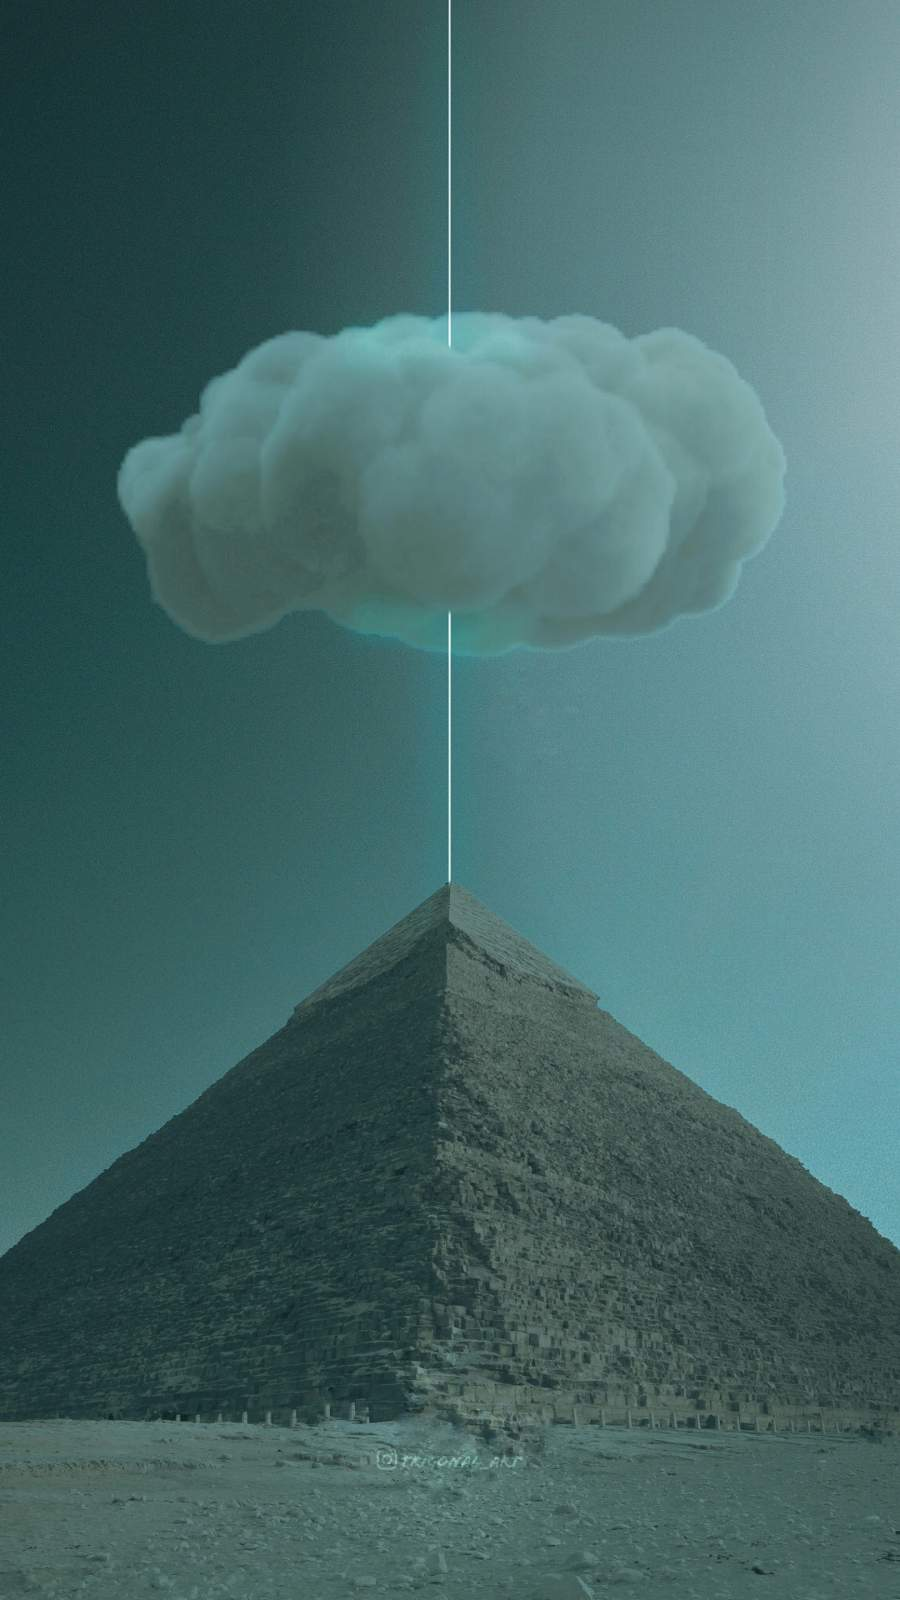 Pyramid Cloud iPhone Wallpaper